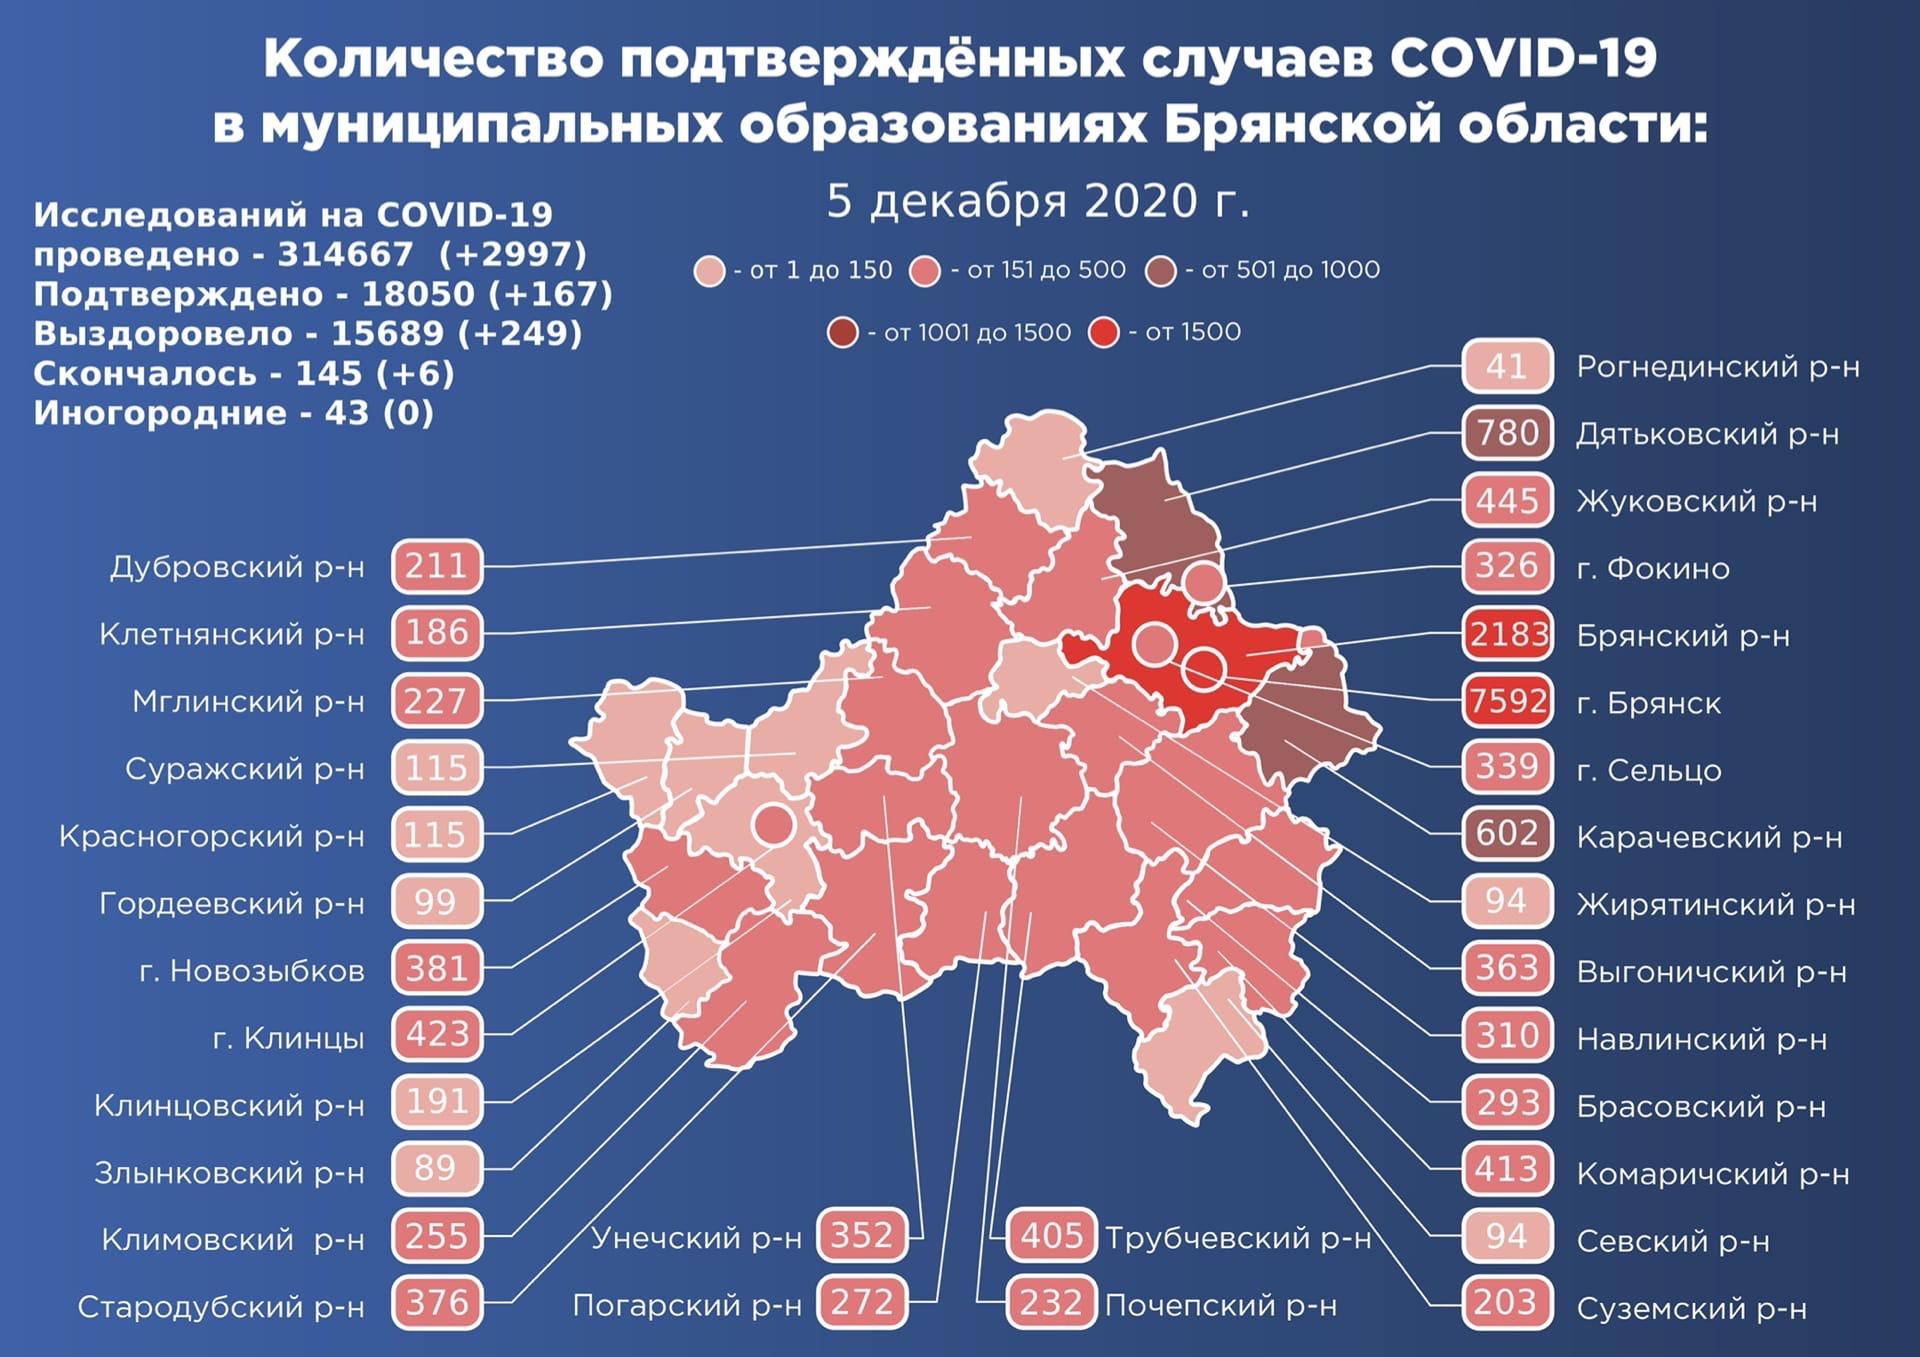 Коронавирус в Брянской области - ситуация на 5 декабря 2020